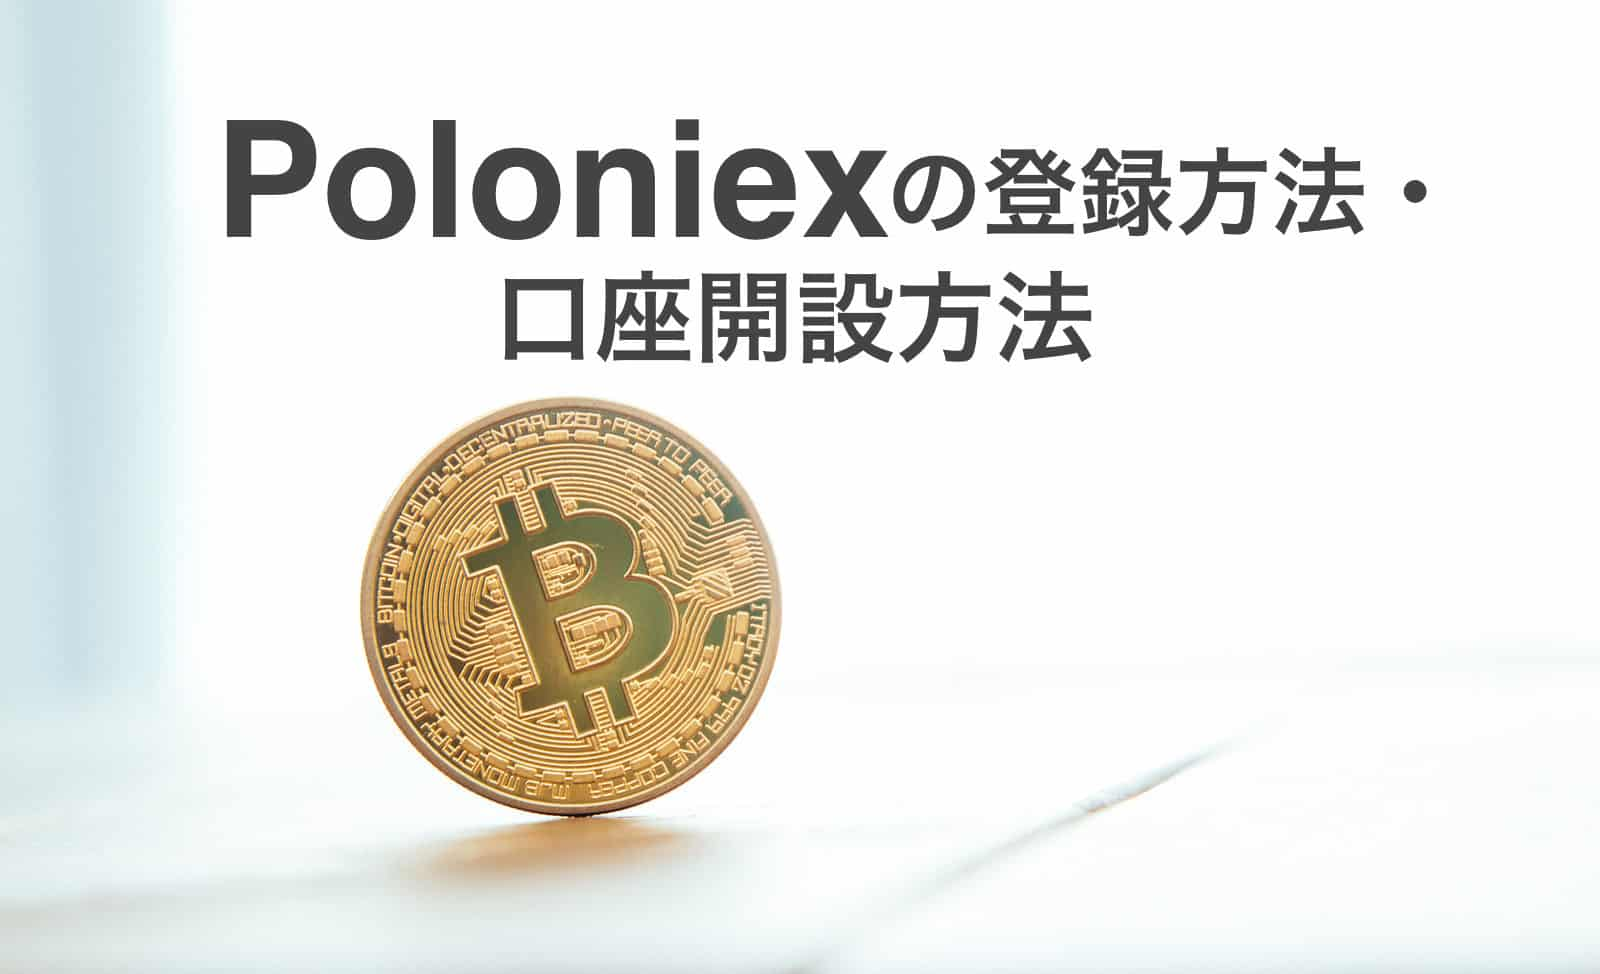 Poloniex(ポロニエックス)の登録方法・口座開設方法